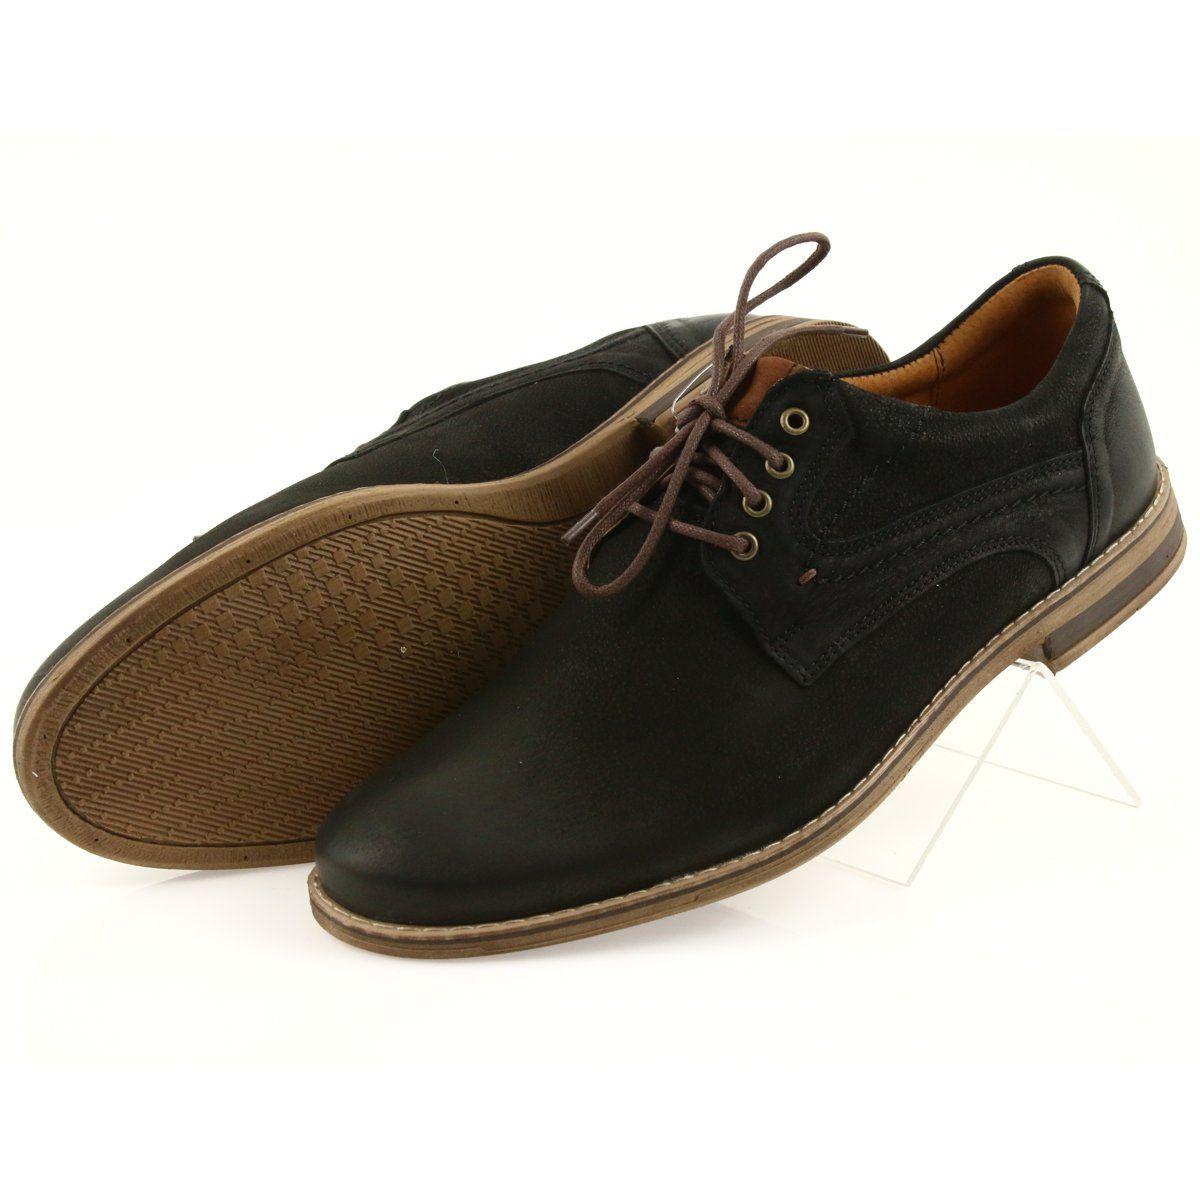 Riko Polbuty Buty Meskie Wiazane 831 Czarne Brazowe Mens Casual Shoes Shoes Martin Shoes